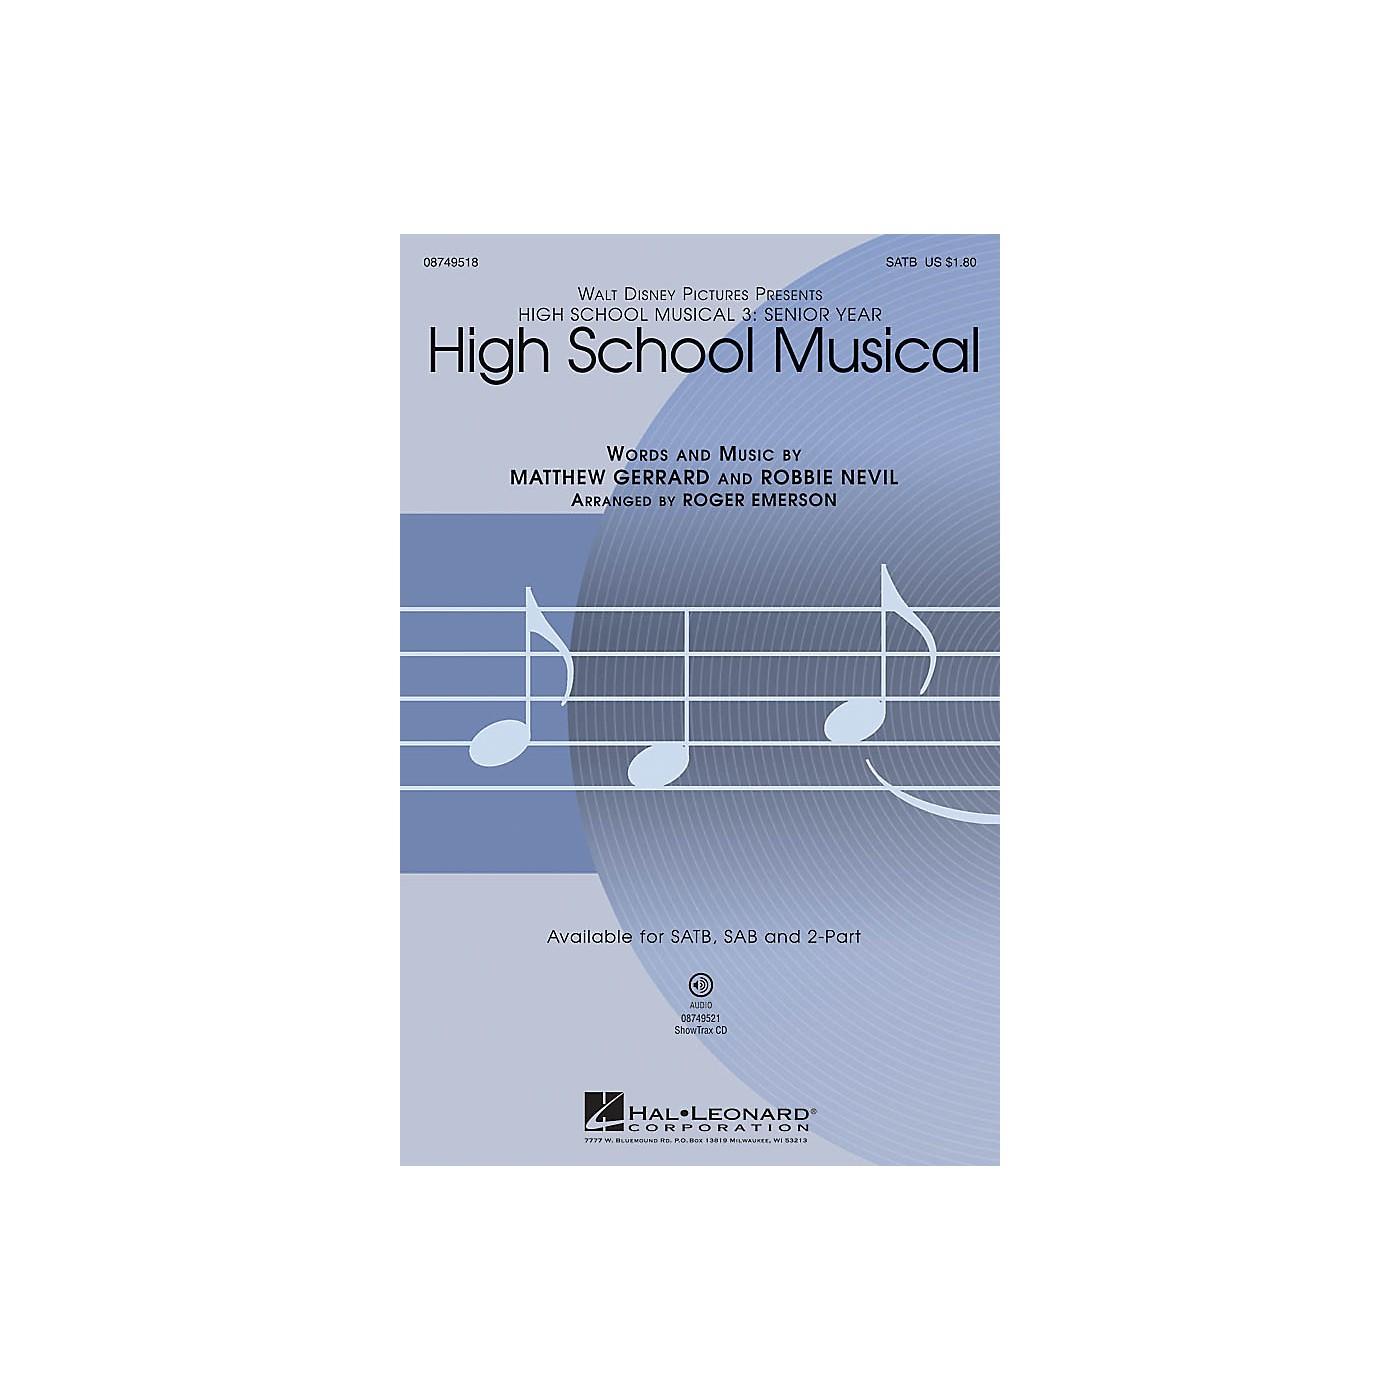 Hal Leonard High School Musical (from High School Musical 3) SATB arranged by Roger Emerson thumbnail